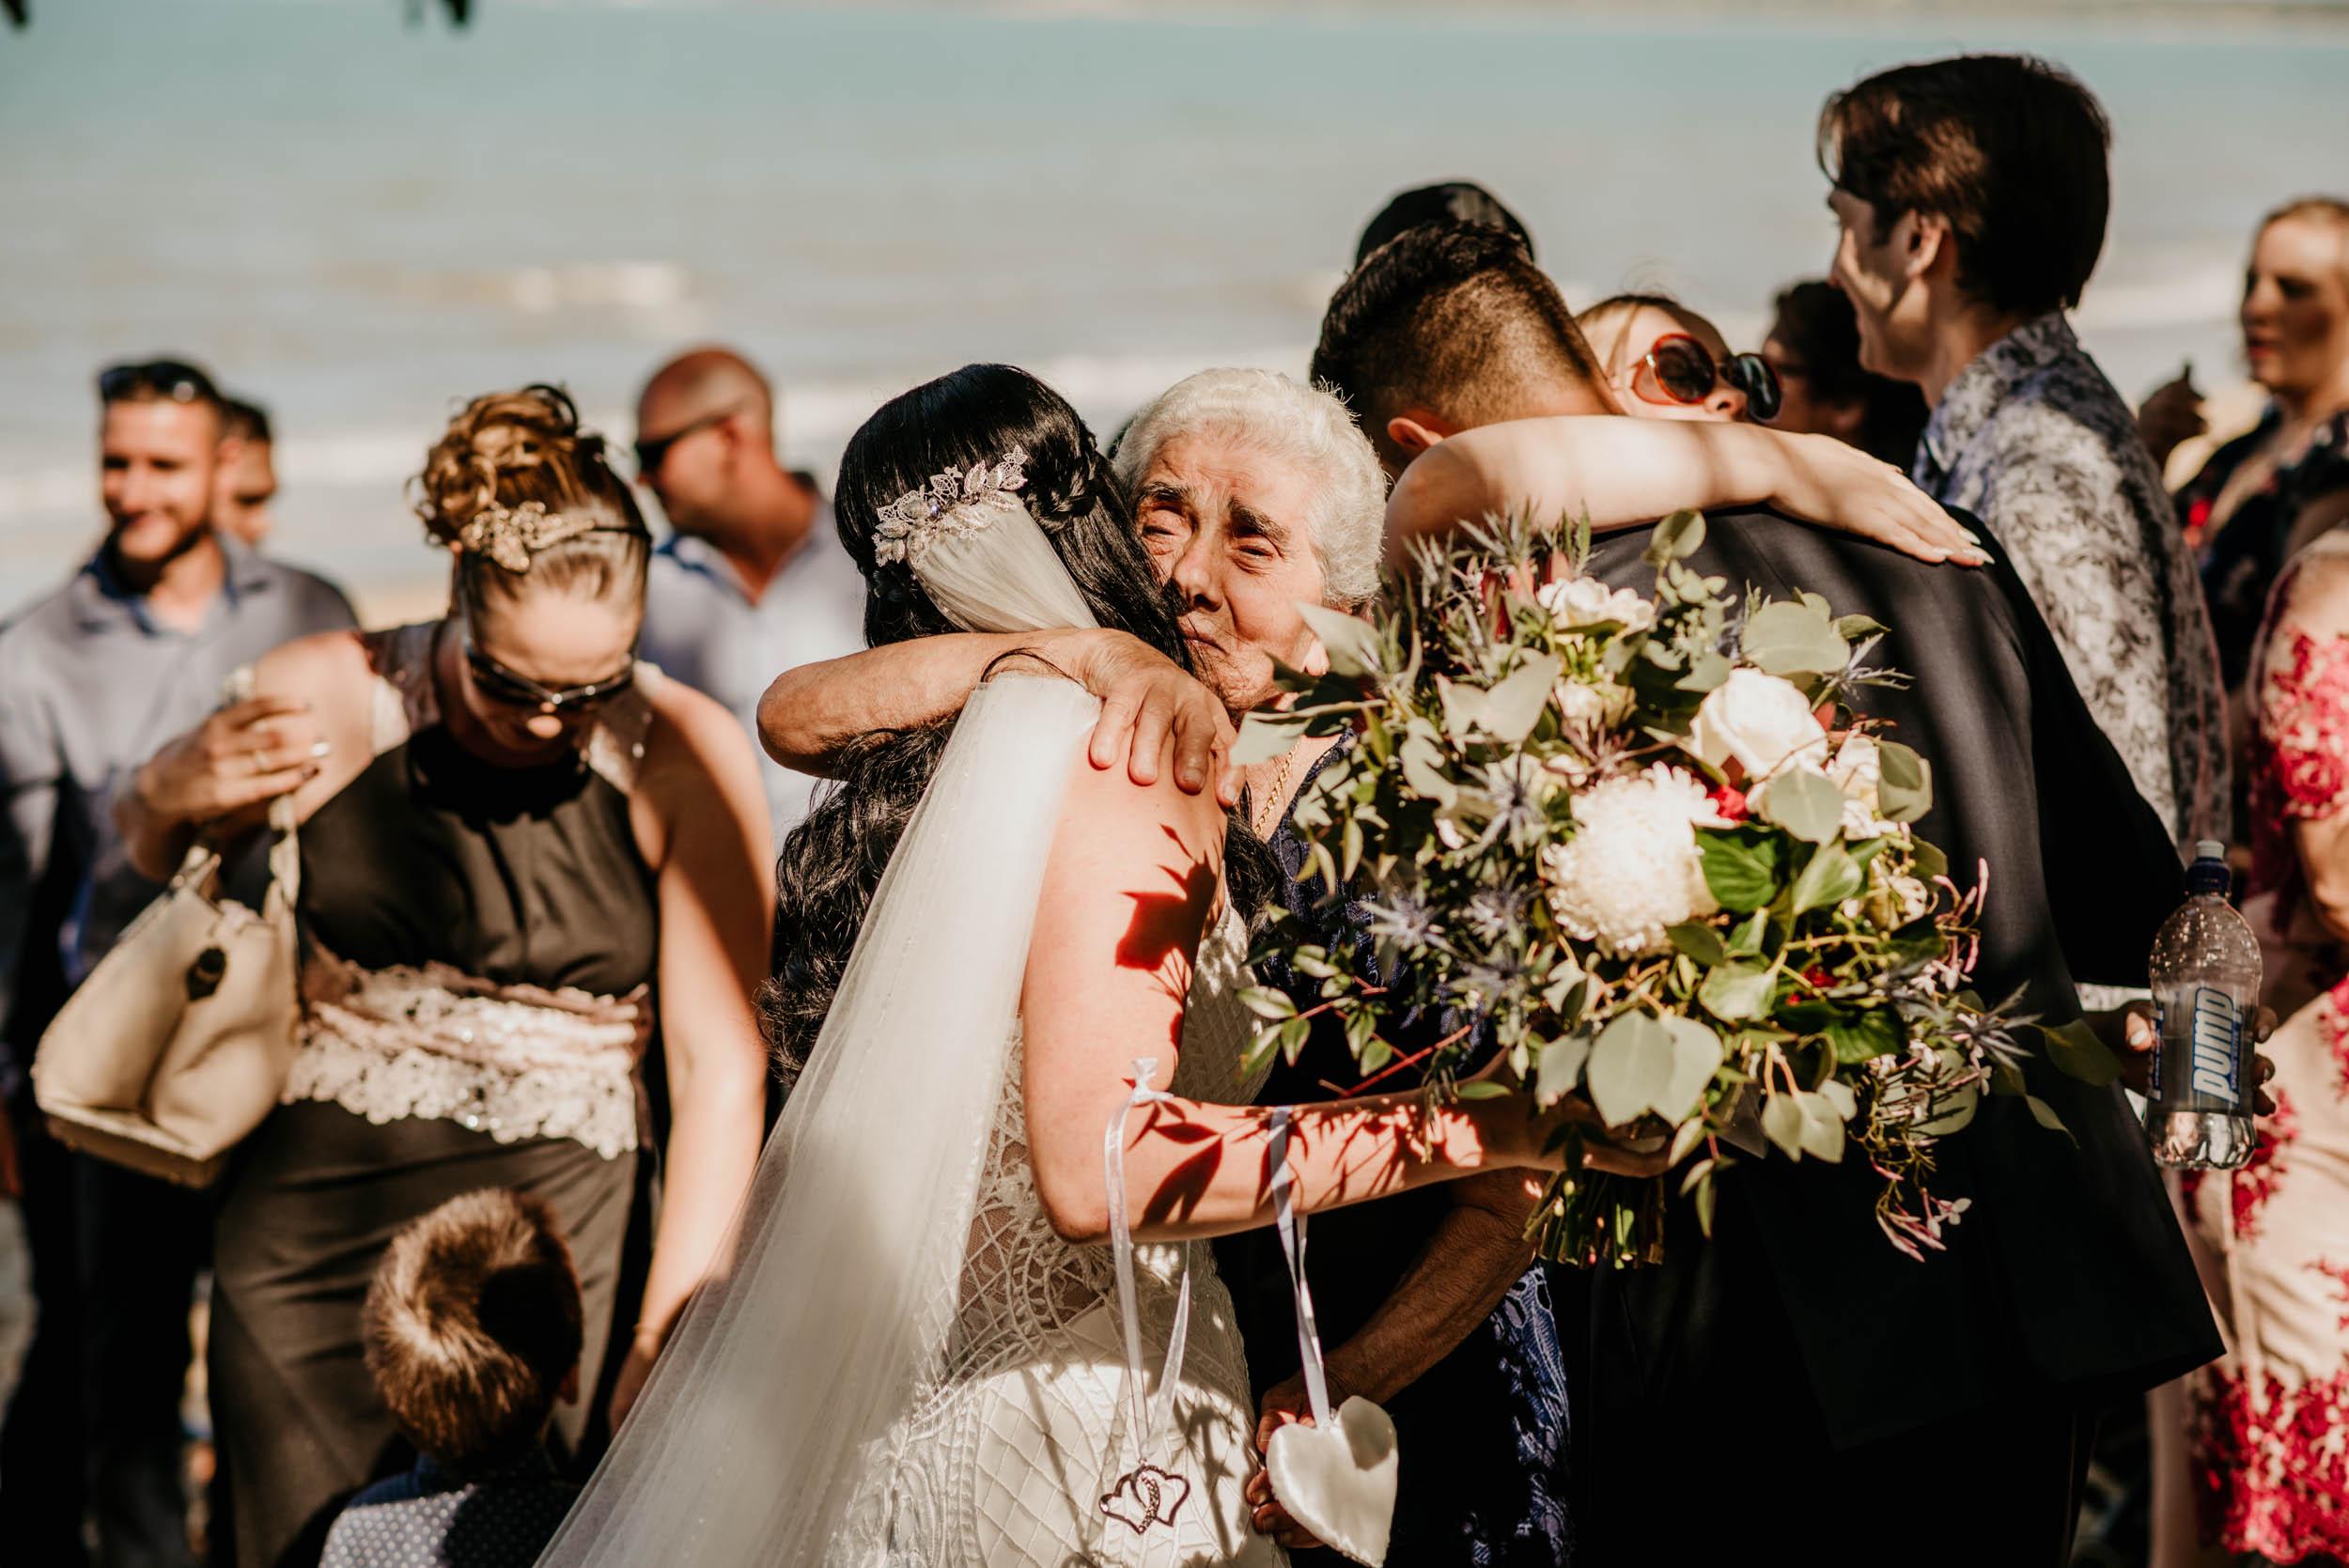 The Raw Photographer - Cairns Wedding Photographer - Beach Palm Cove Ceremony - Dress Irene Costa's Devine Bridal - Queensland-38.jpg